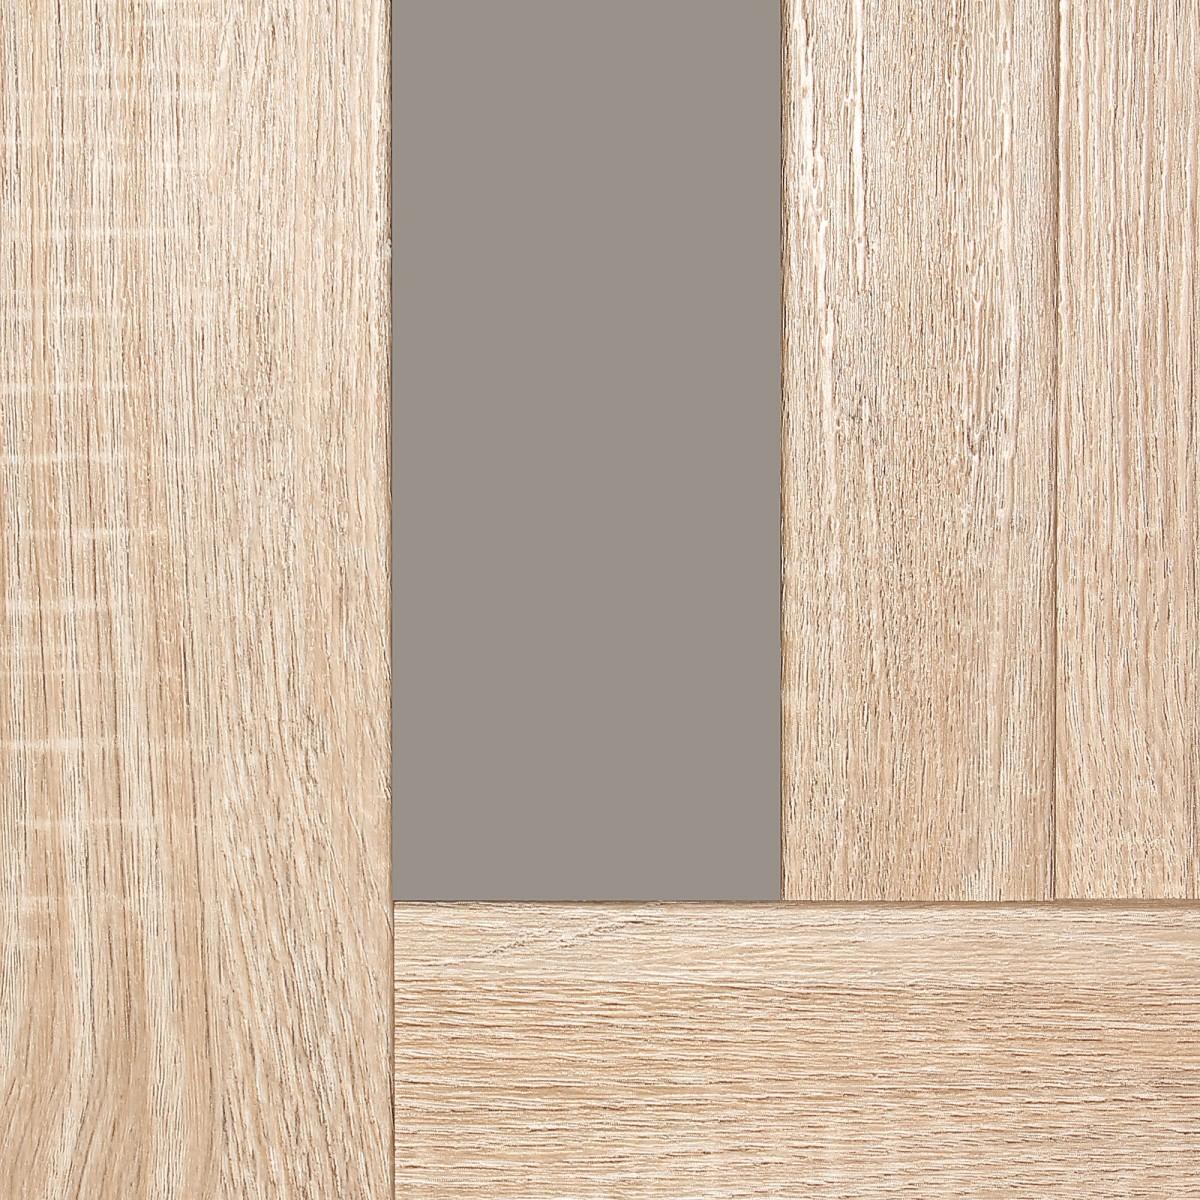 Дверь Межкомнатная Глухая Artens Леона 60x200 Цвет Натуральный Дуб